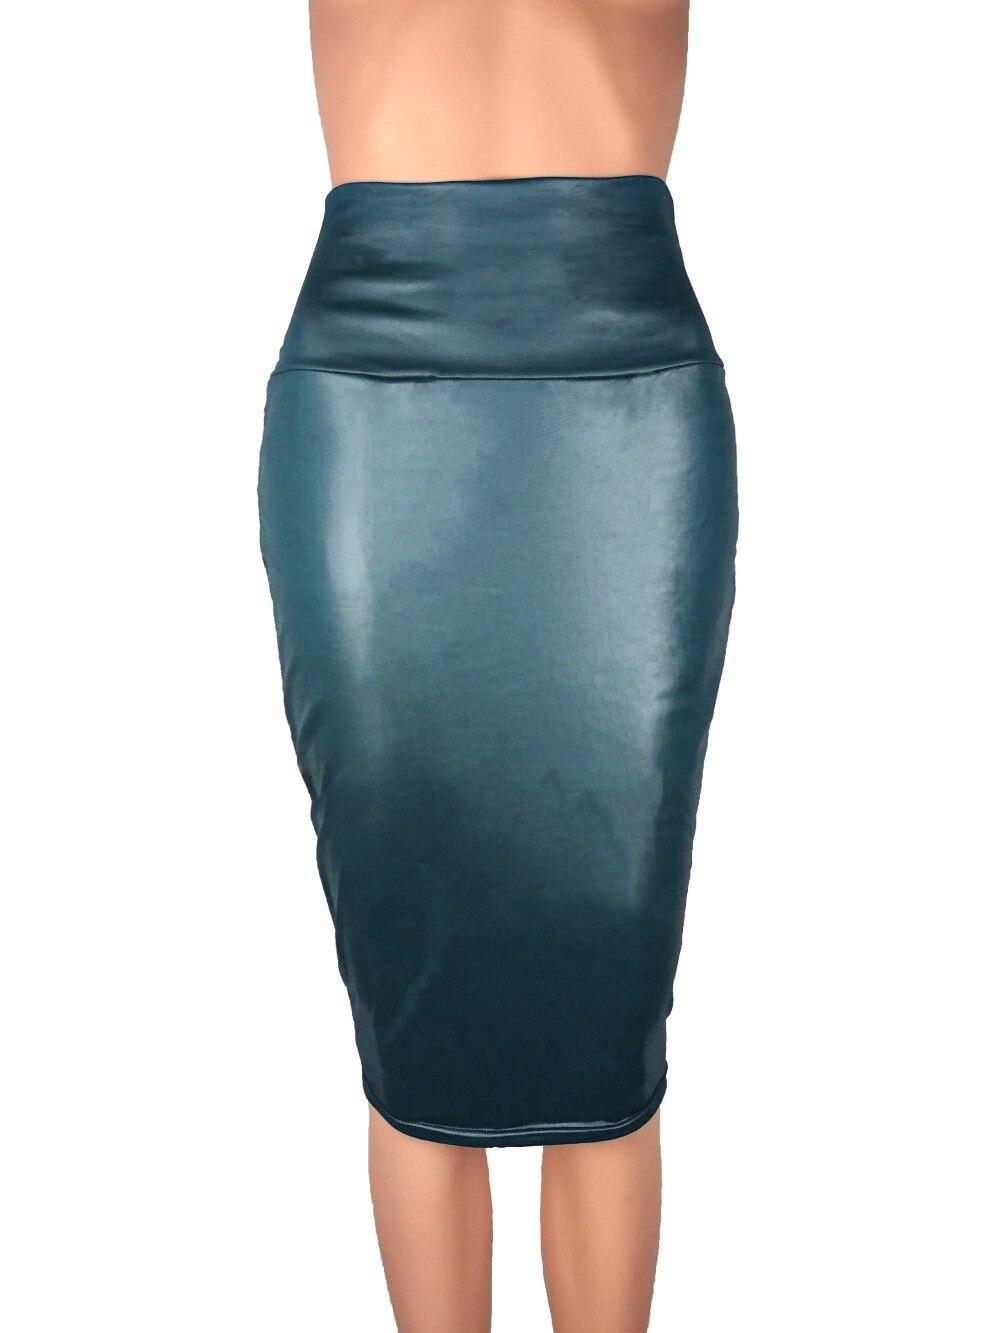 Bohocotol 19 pencil faux leather skirt women casual plus size clothing chic elegant sexy fitness black midi pencil skirts 3